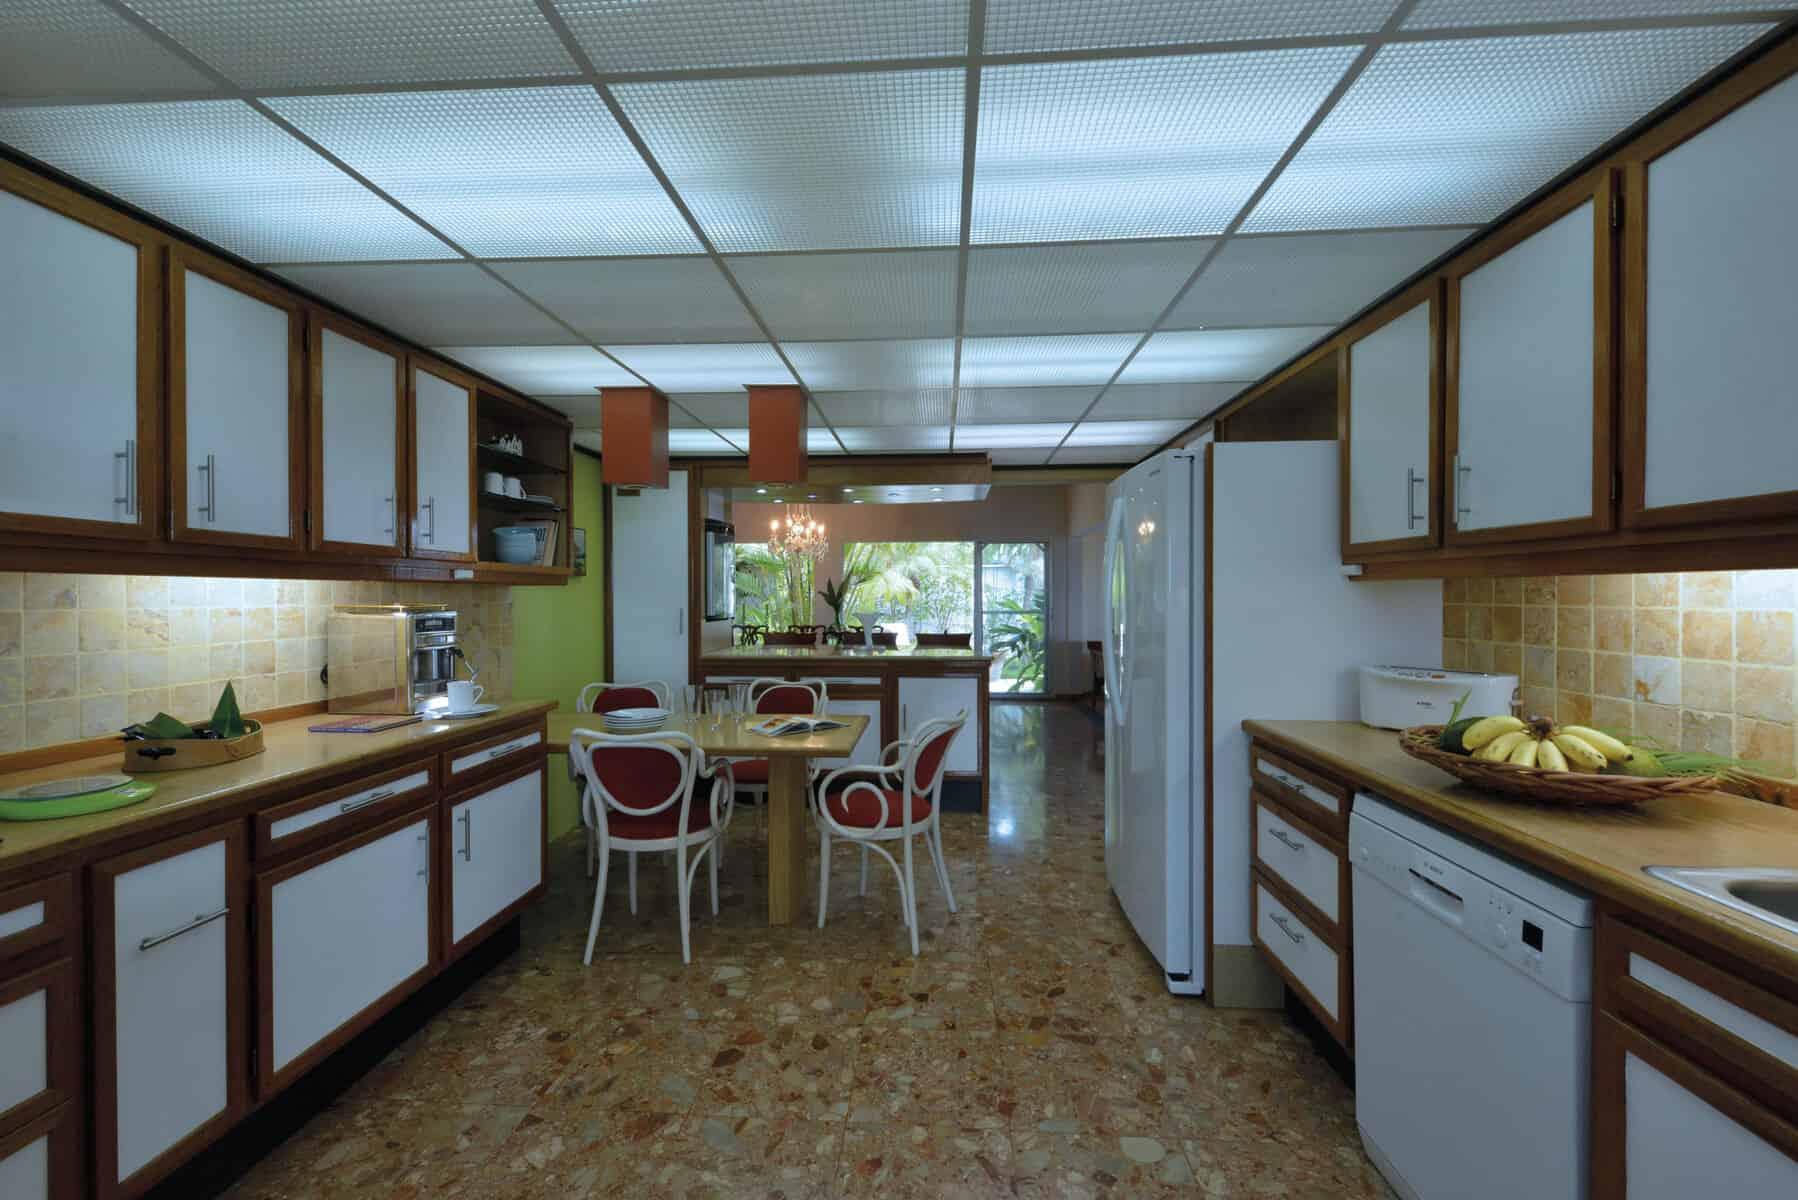 Zeph kitchen